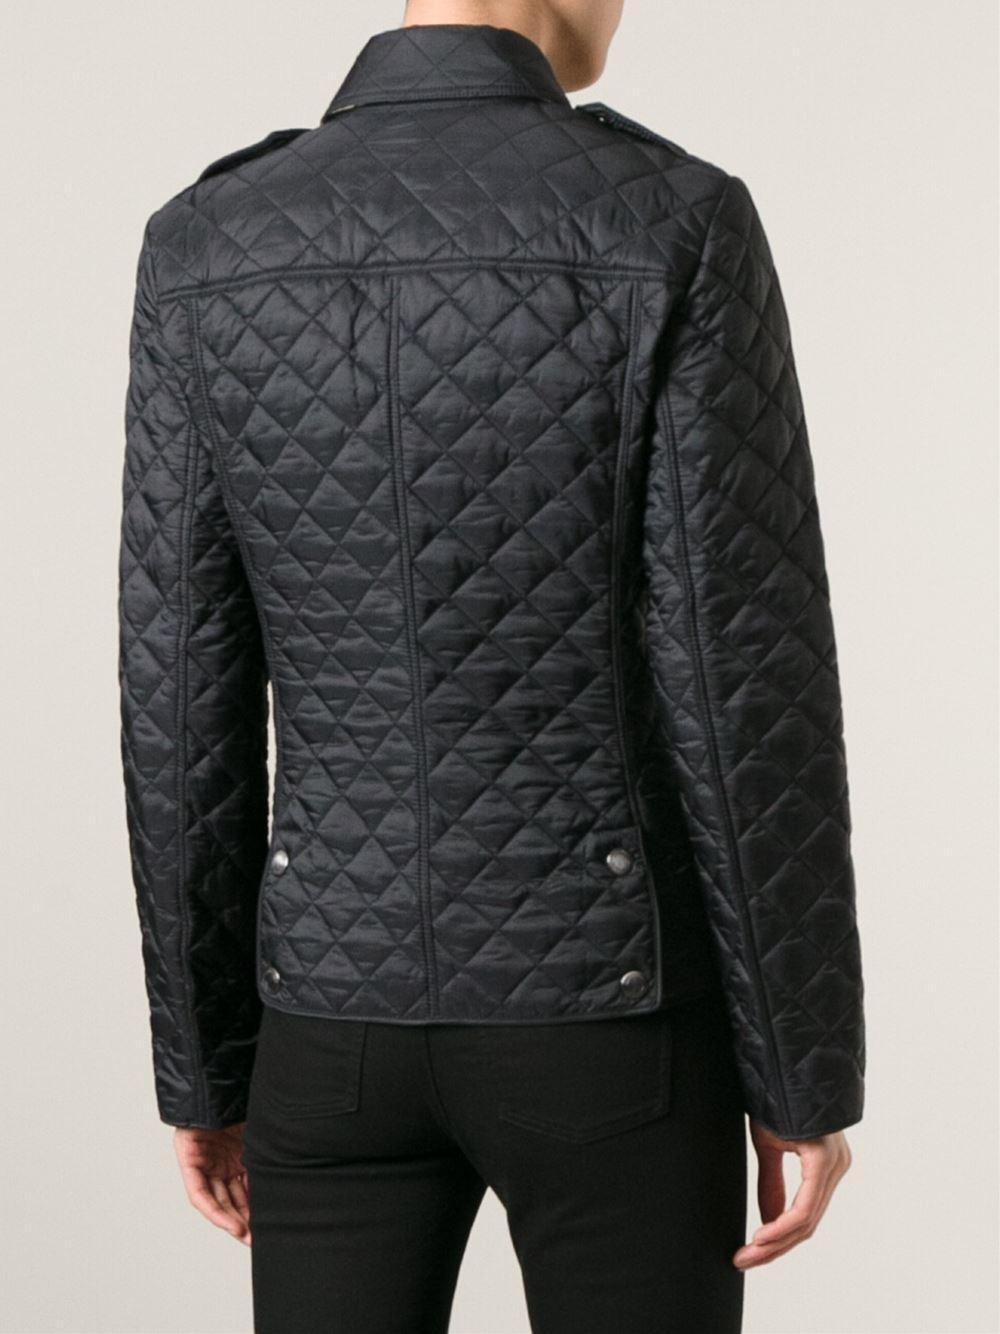 burberry brit quilted jacket in black lyst. Black Bedroom Furniture Sets. Home Design Ideas